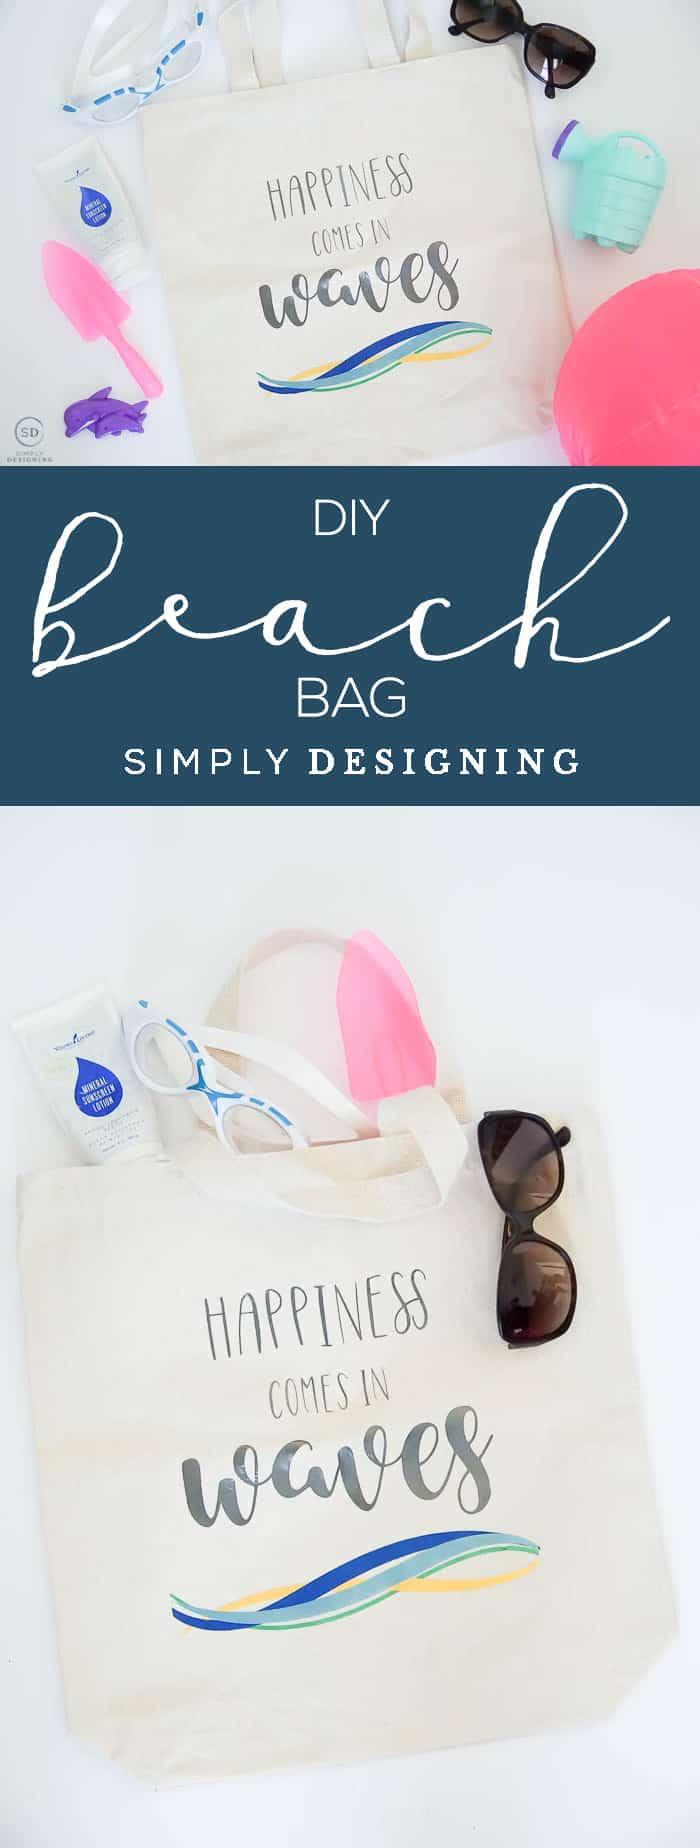 DIY Beach Bag - How to make a Tote Bag with Vinyl - Vinyl Beach Bag